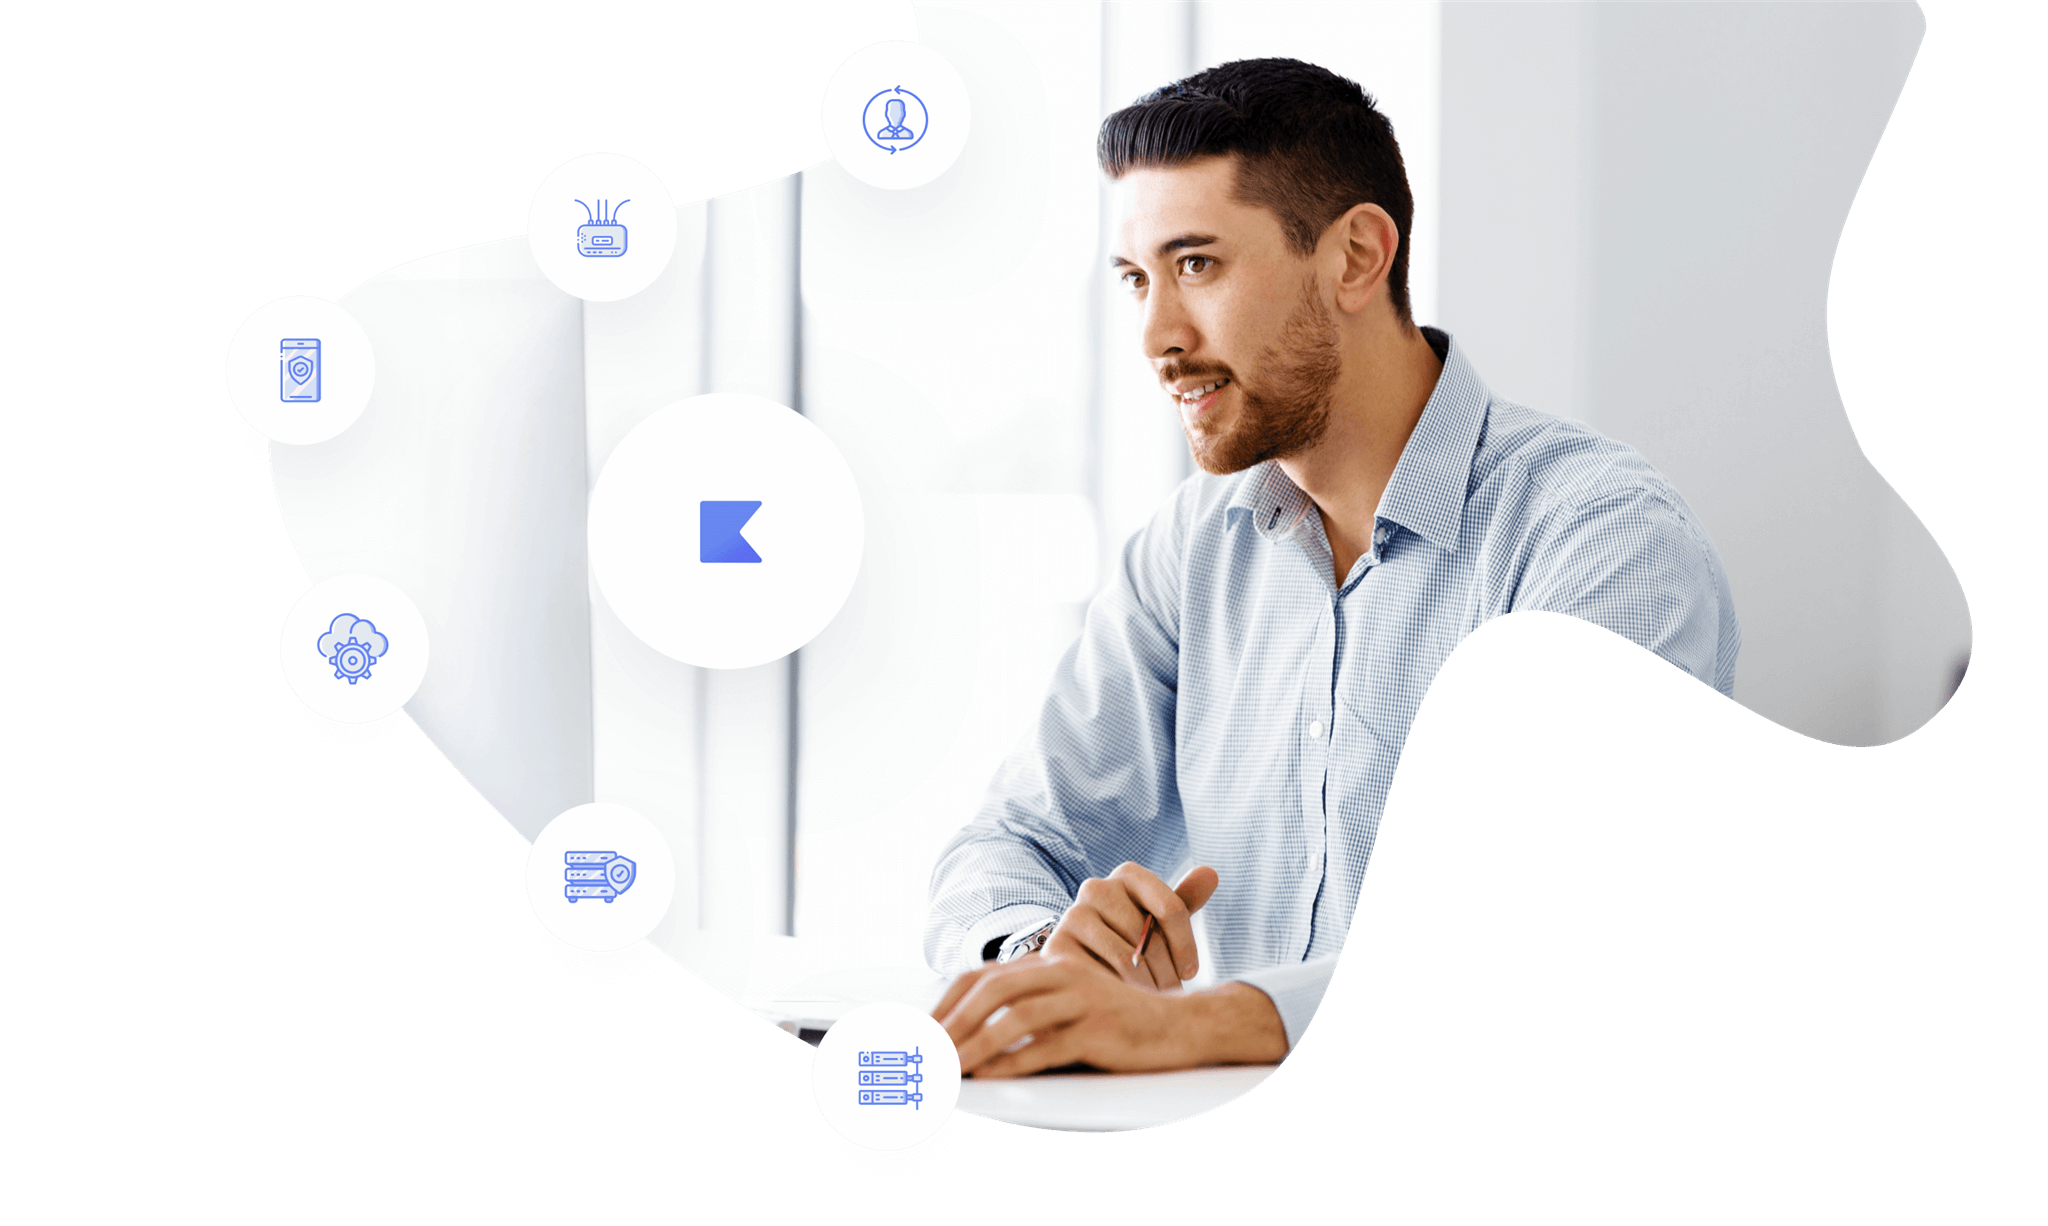 Kisi Product Platform